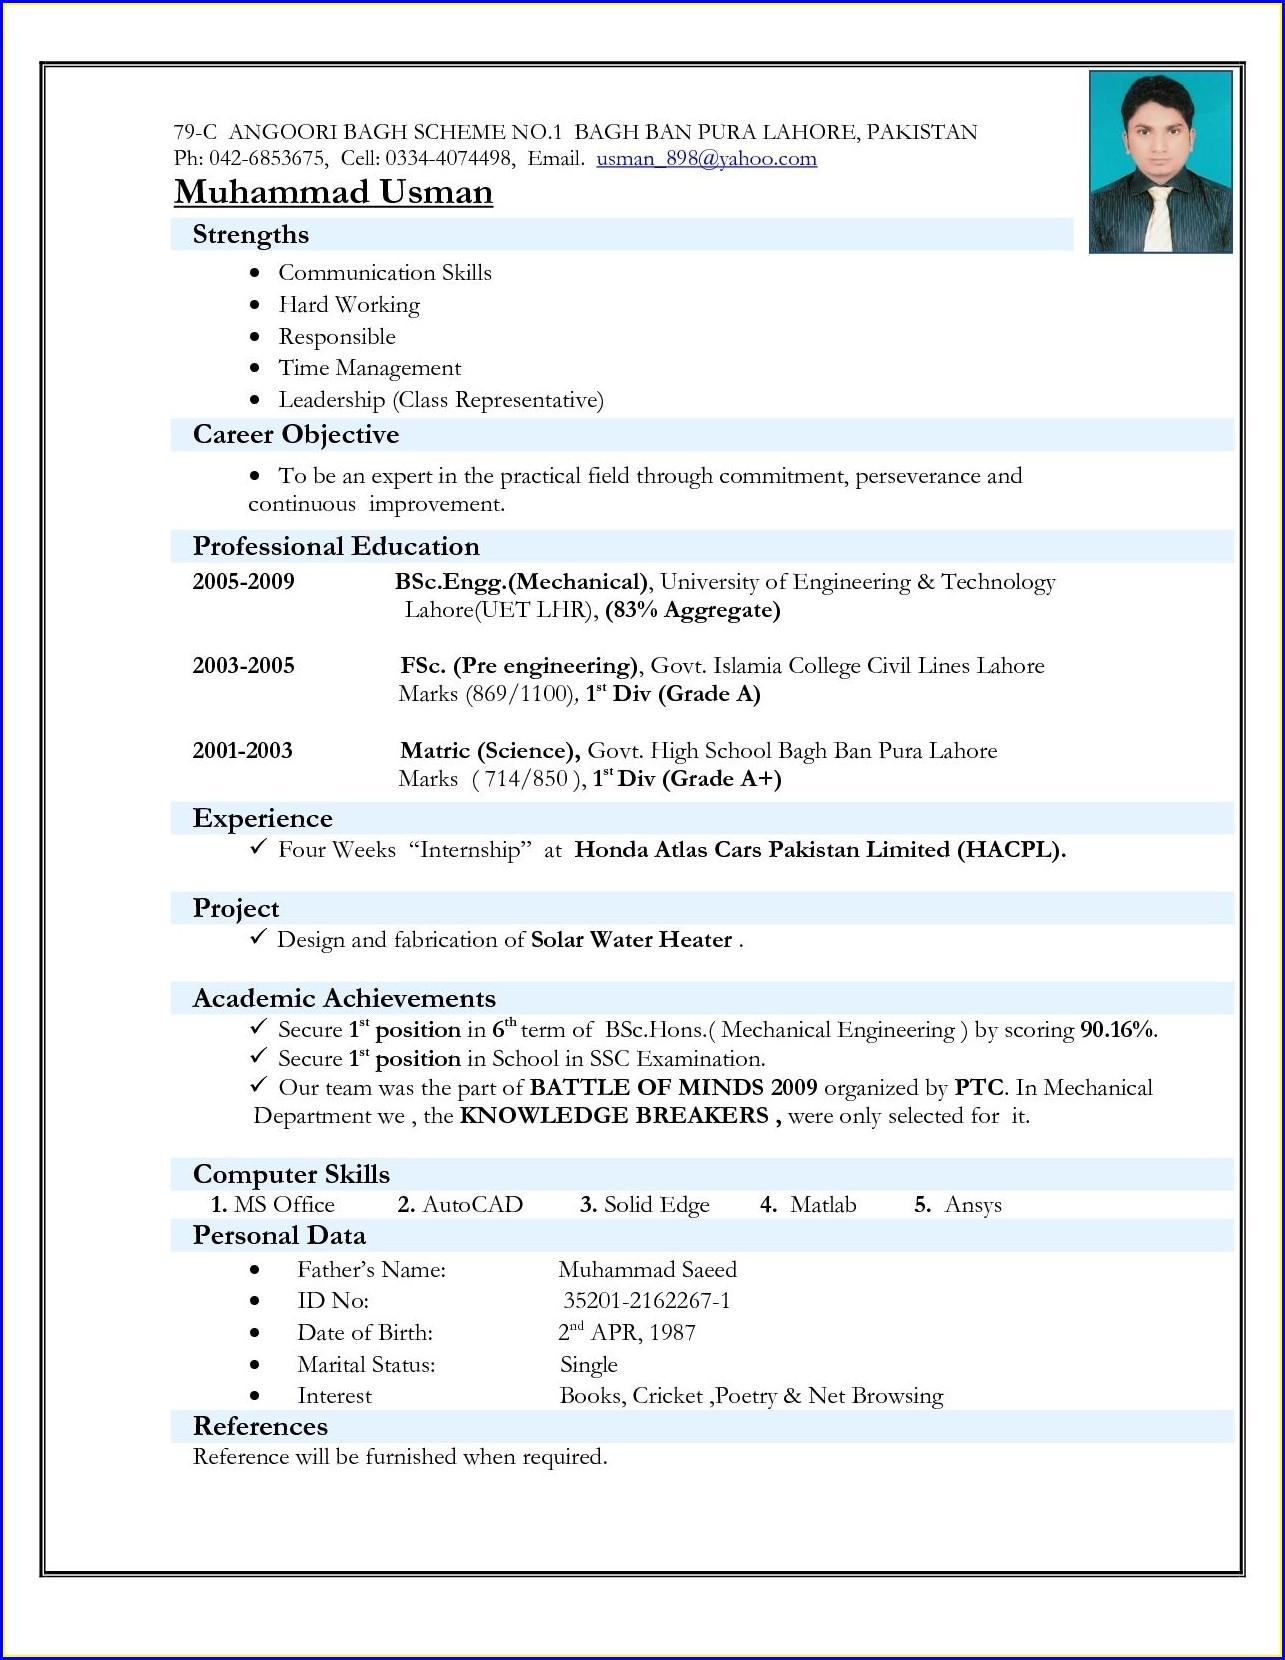 Pdf Resume For Fresher Mechanical Engineer